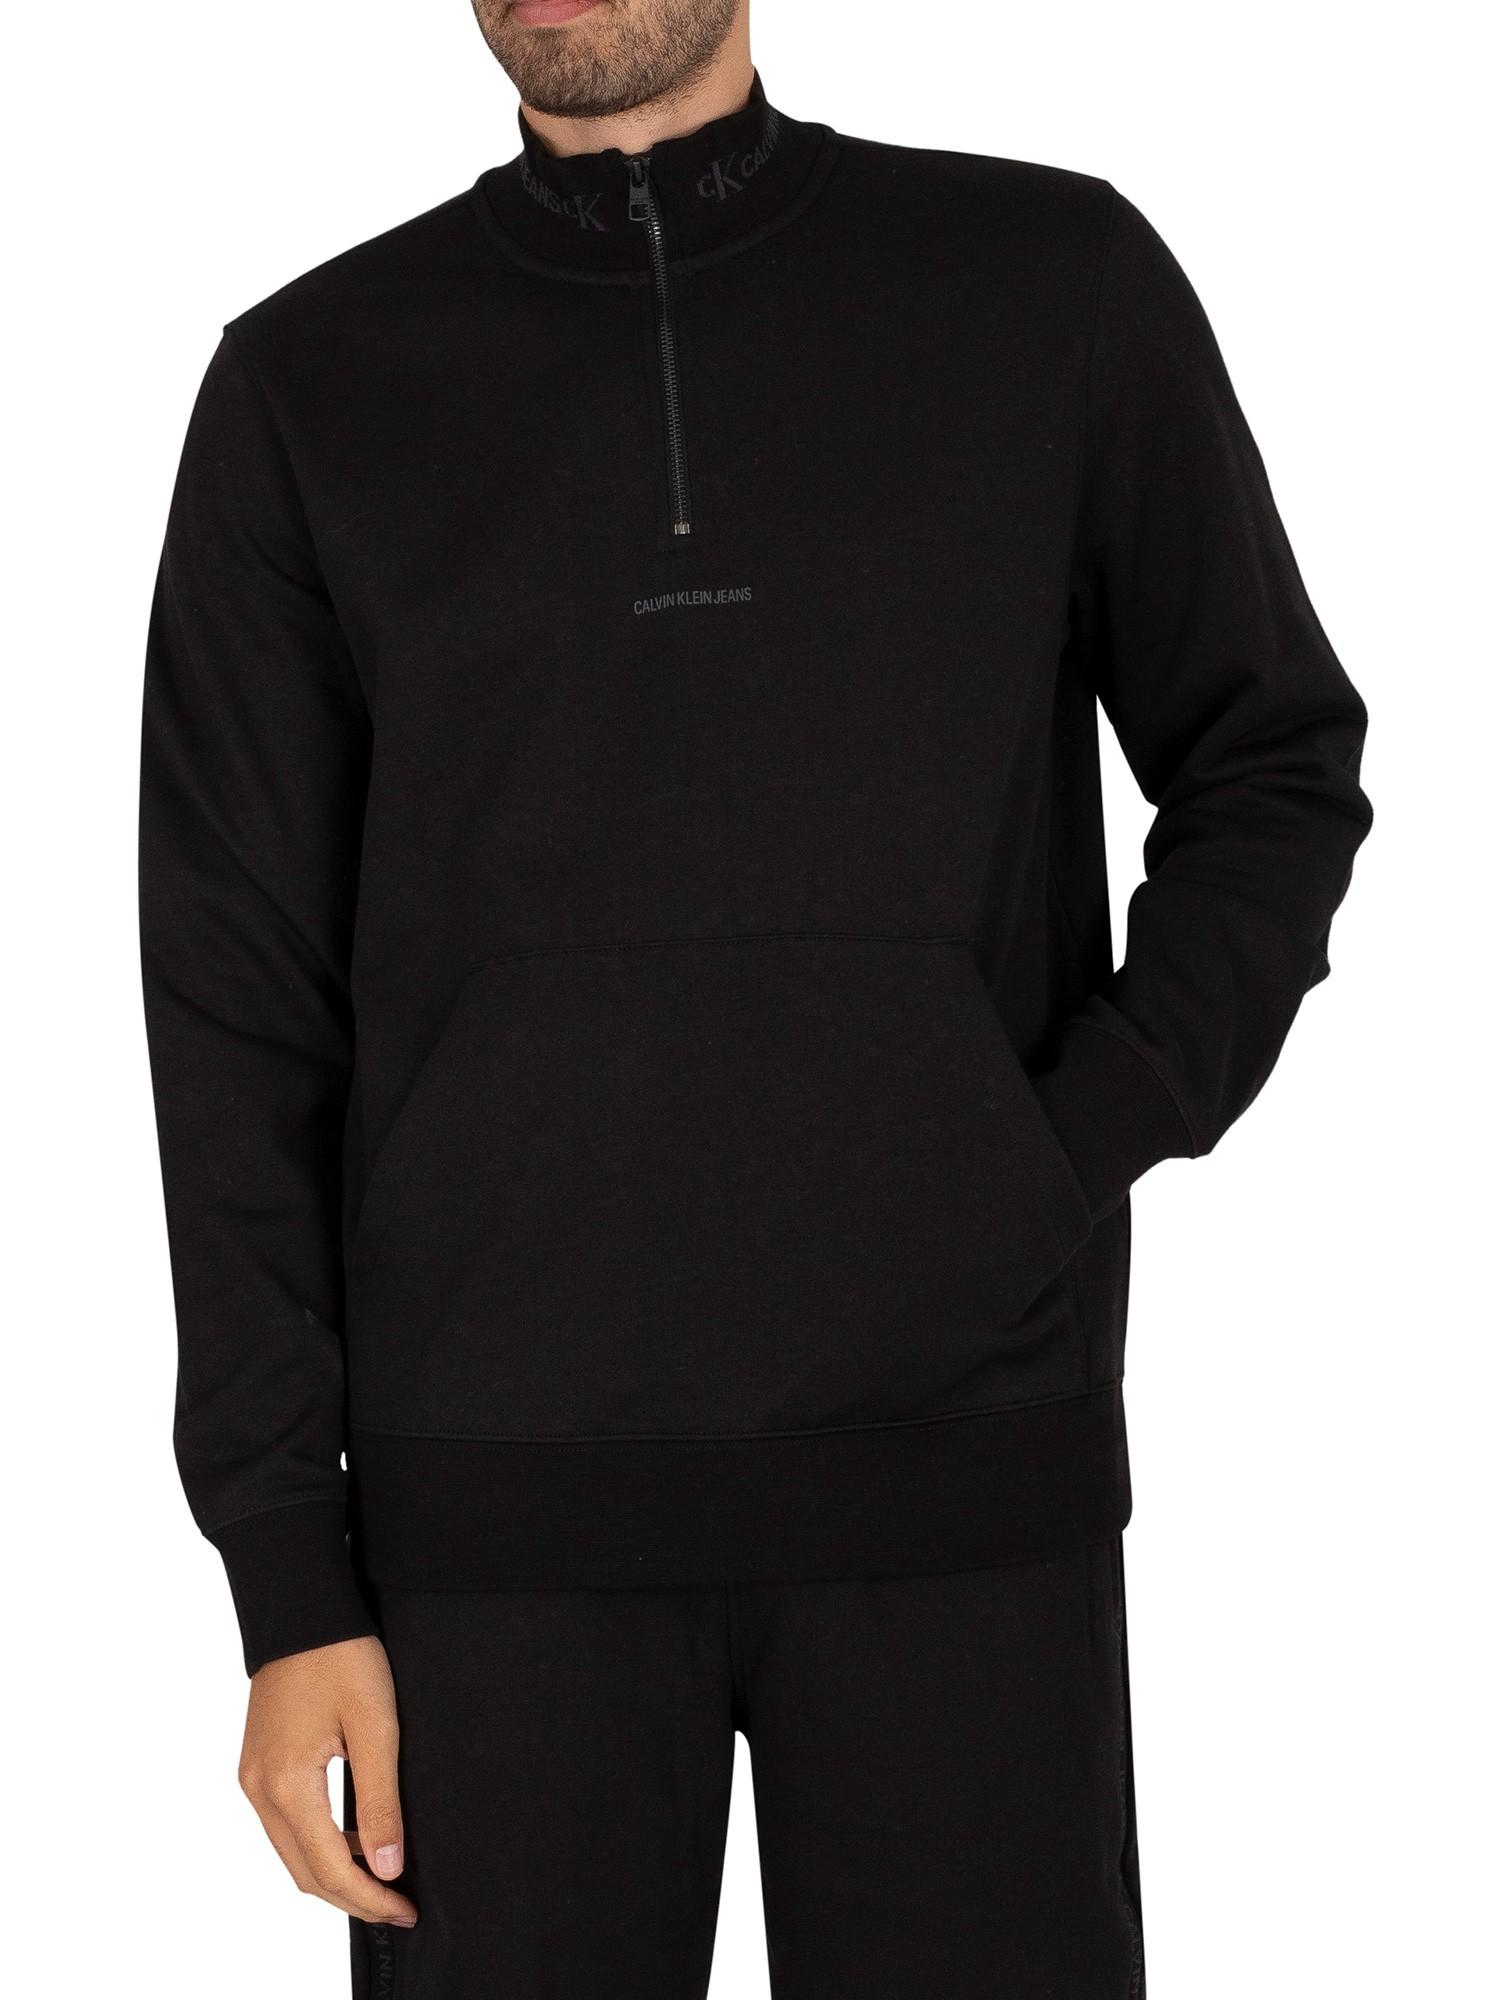 Logo-Jacquard-Mockneck-Sweatshirt